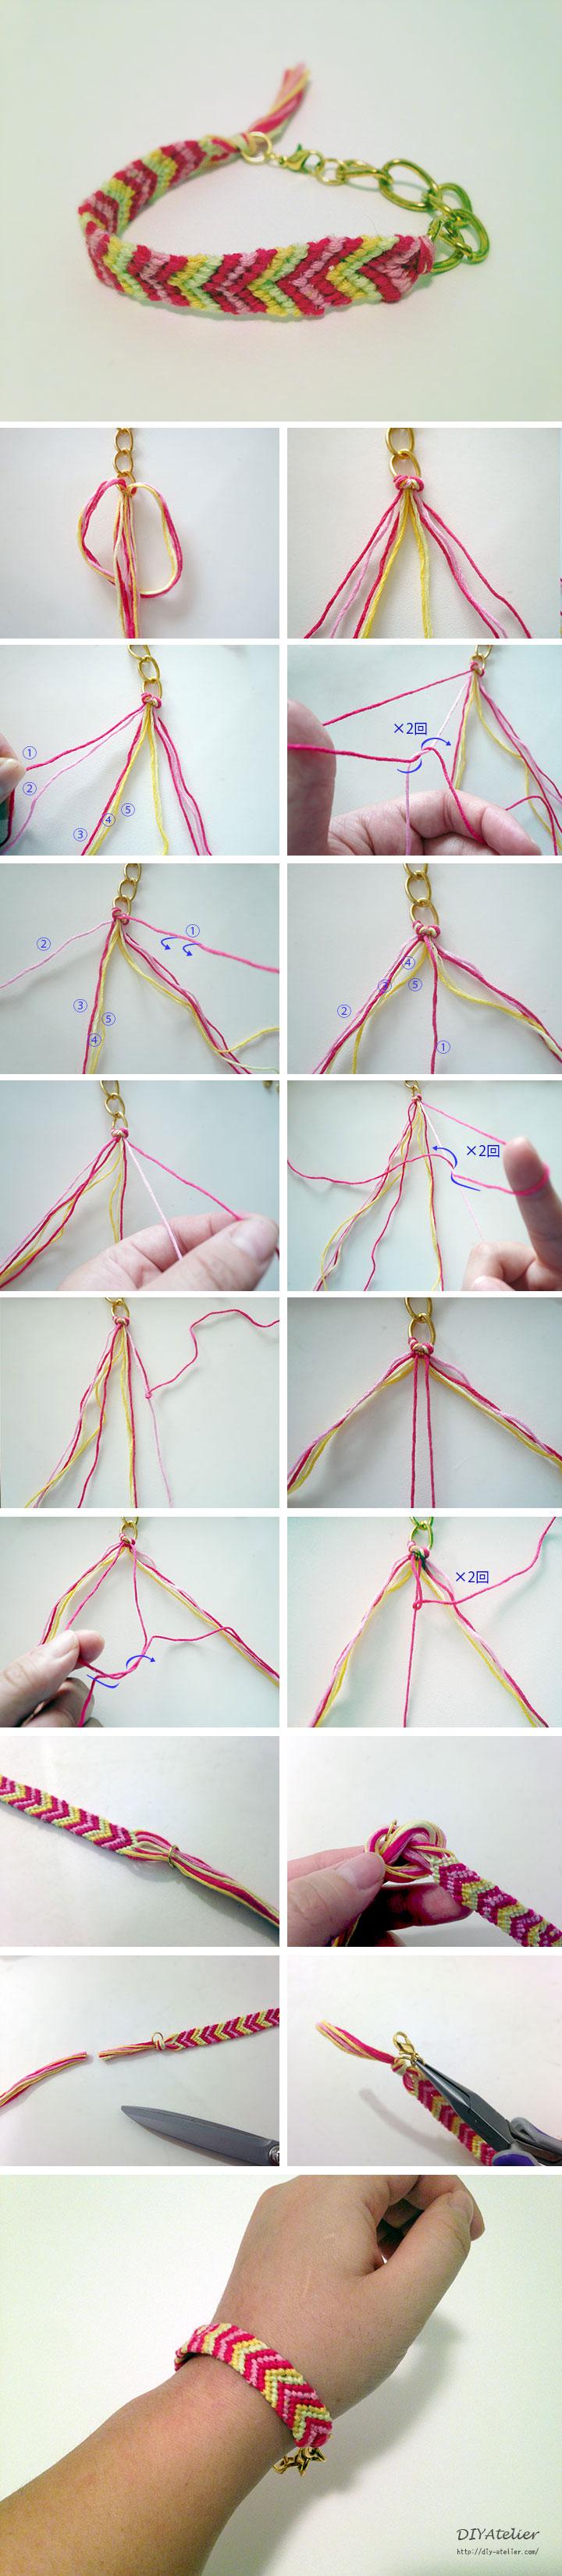 braided_chain_bracelet